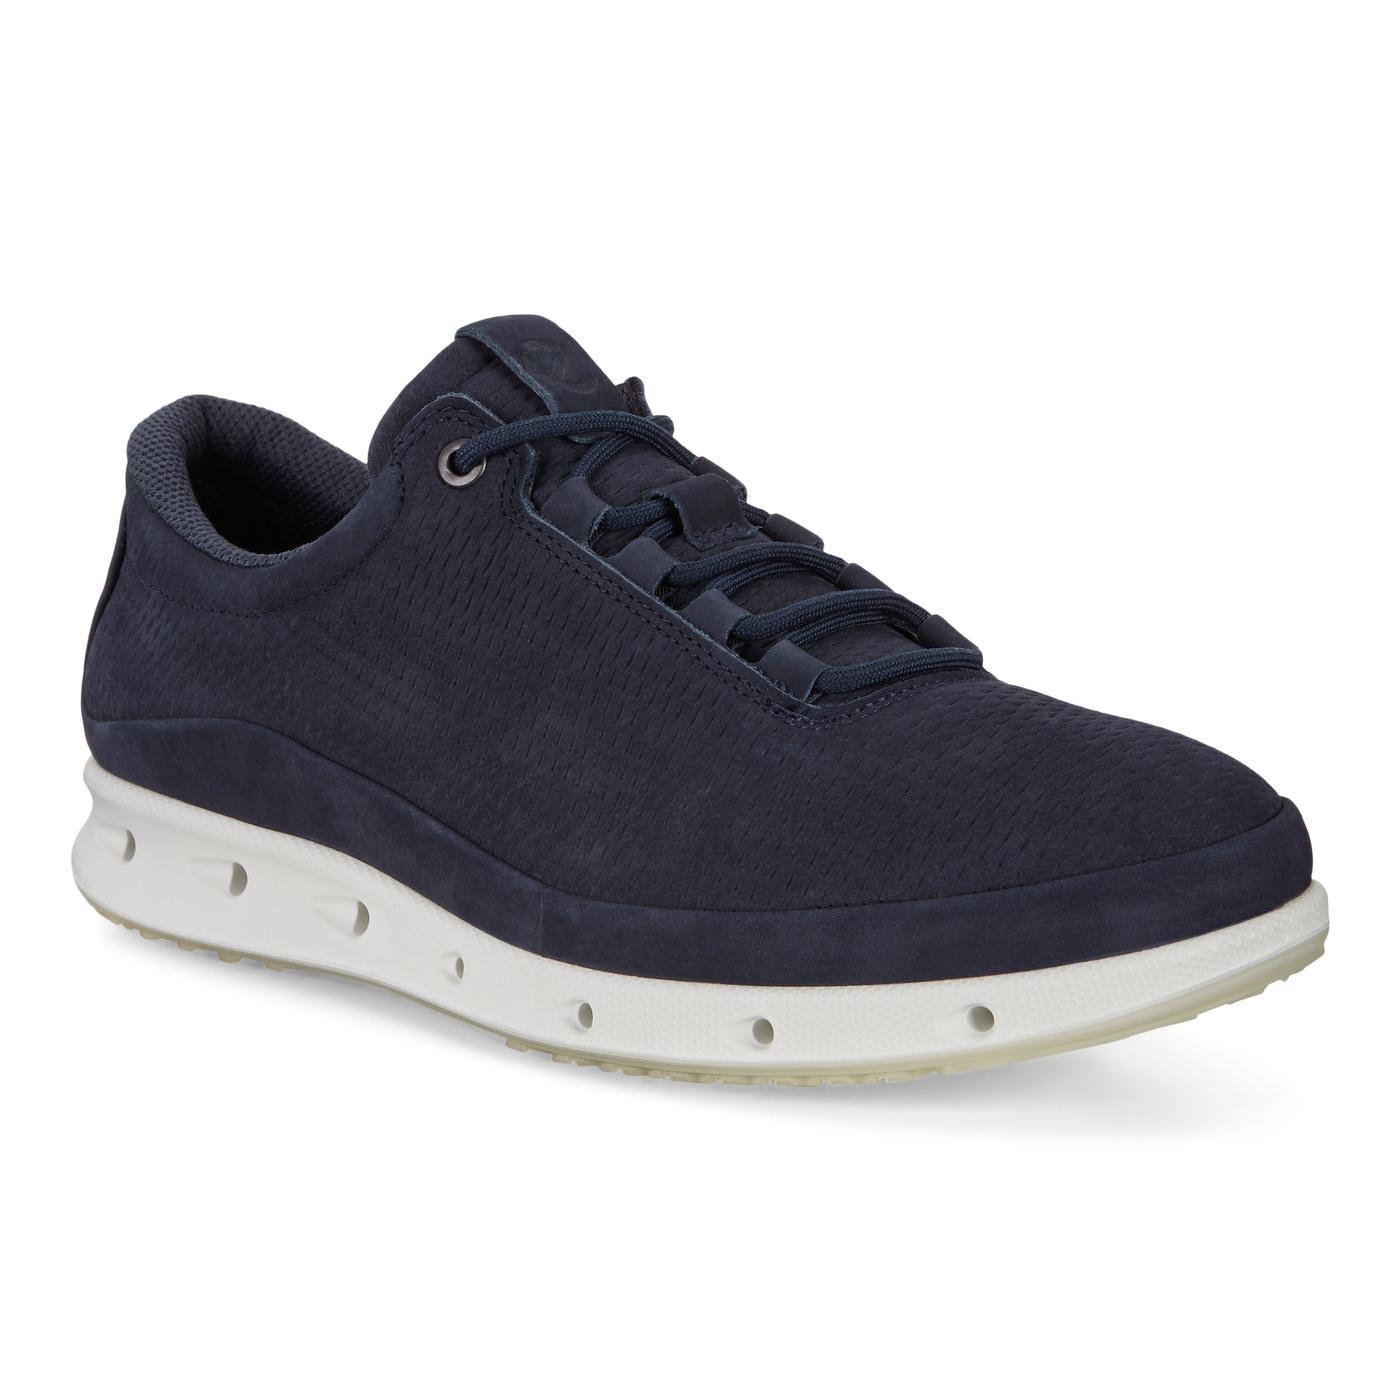 ECCO COOL Mens Embossed Leather Sneaker GTX